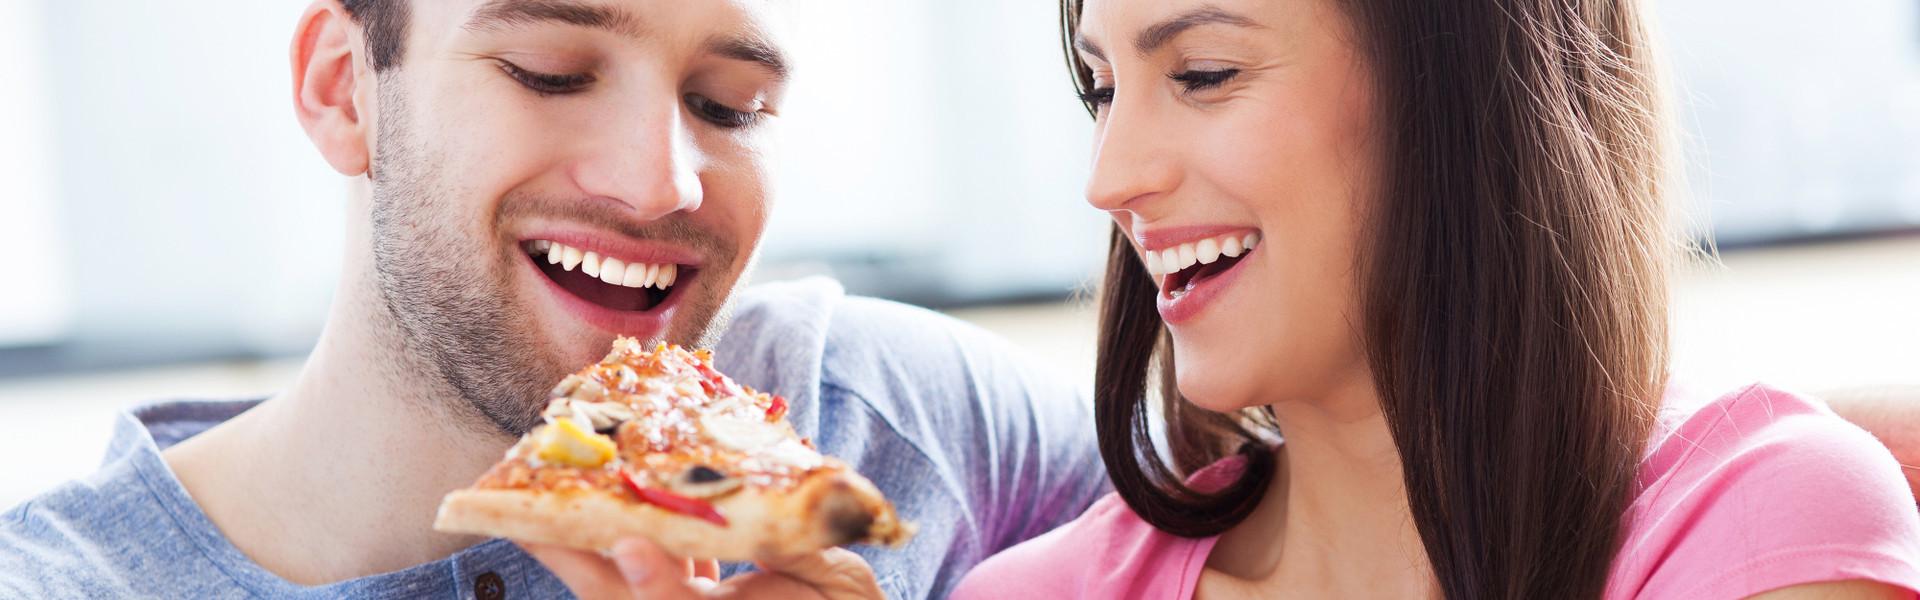 Eating Cordovano Joe's Pizza Orlando Florida | The Best NY Style Pizza in Orlando | Westgate Lakes Resort & Spa